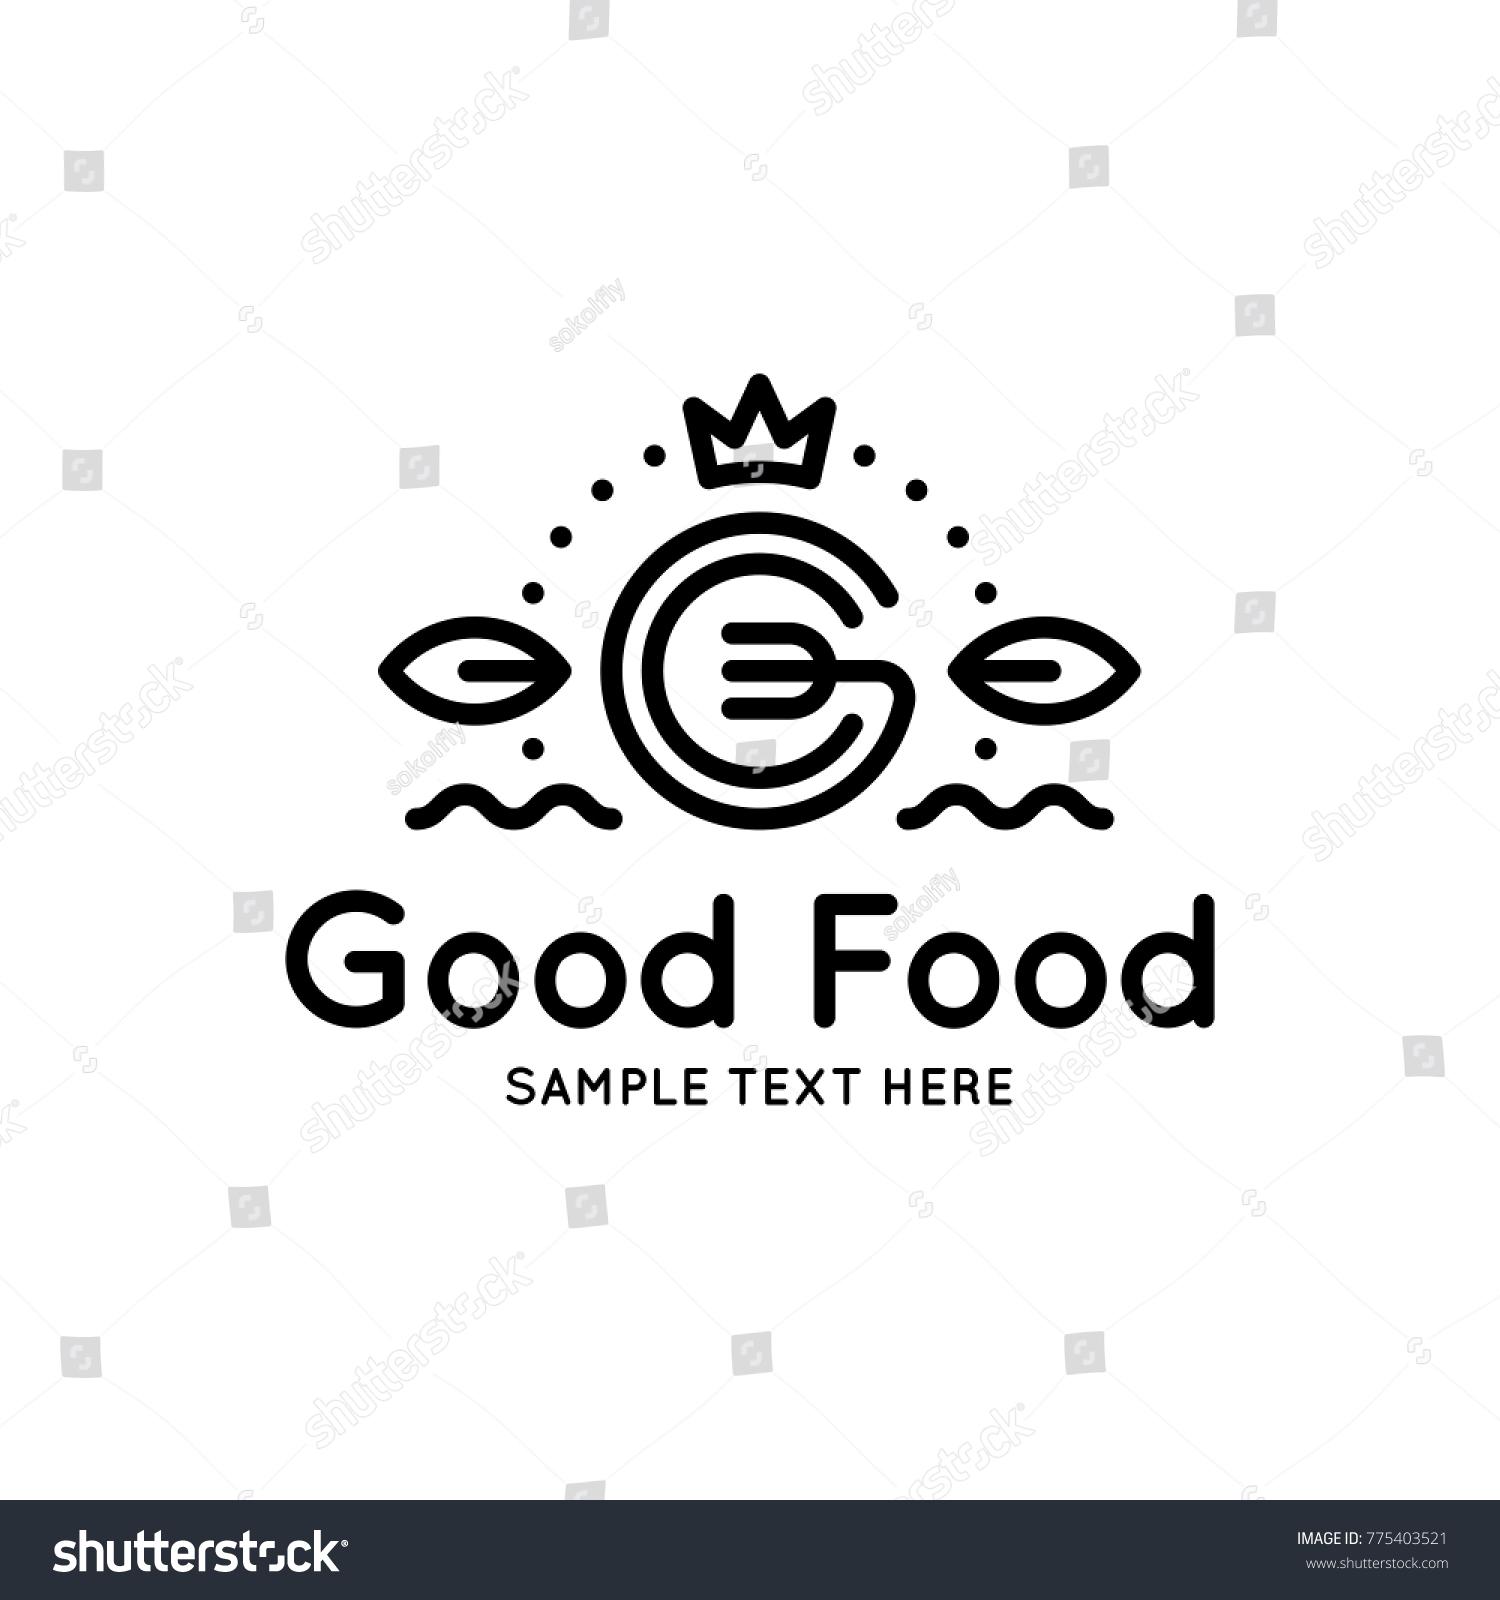 good food logo design template vector のベクター画像素材